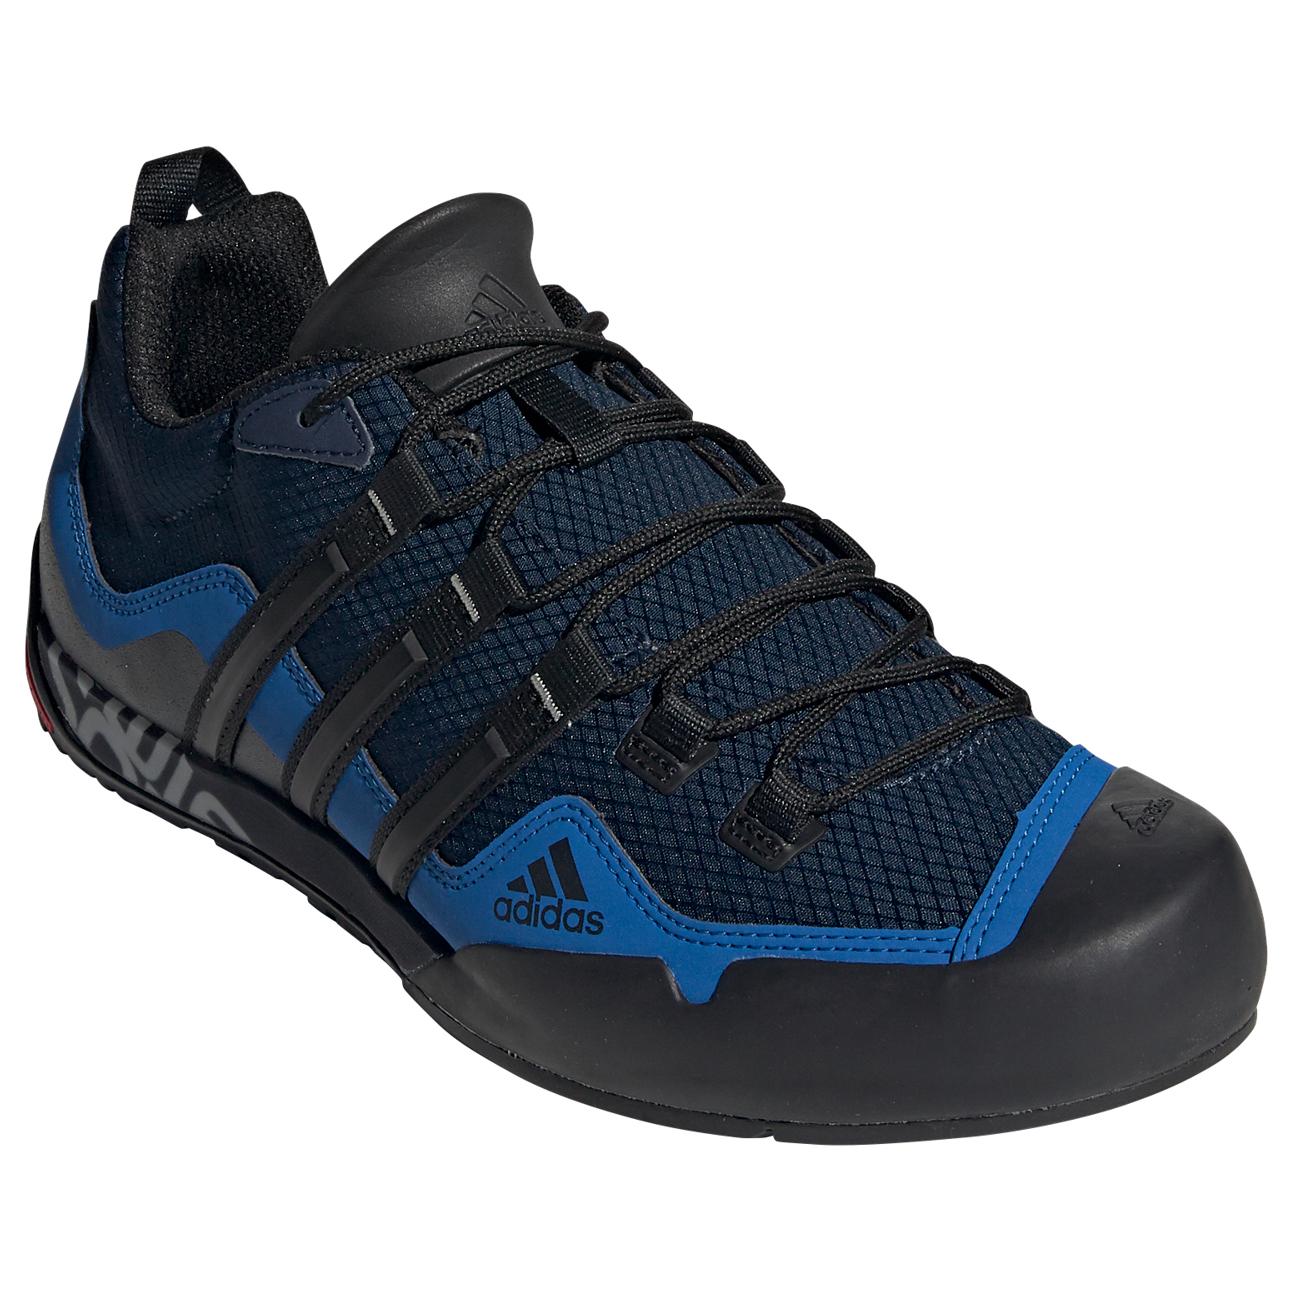 united states fashion styles best supplier adidas - Terrex Swift Solo - Approachschuhe - Collegiate Navy / Core Black  / Blue | 7,5 (UK)